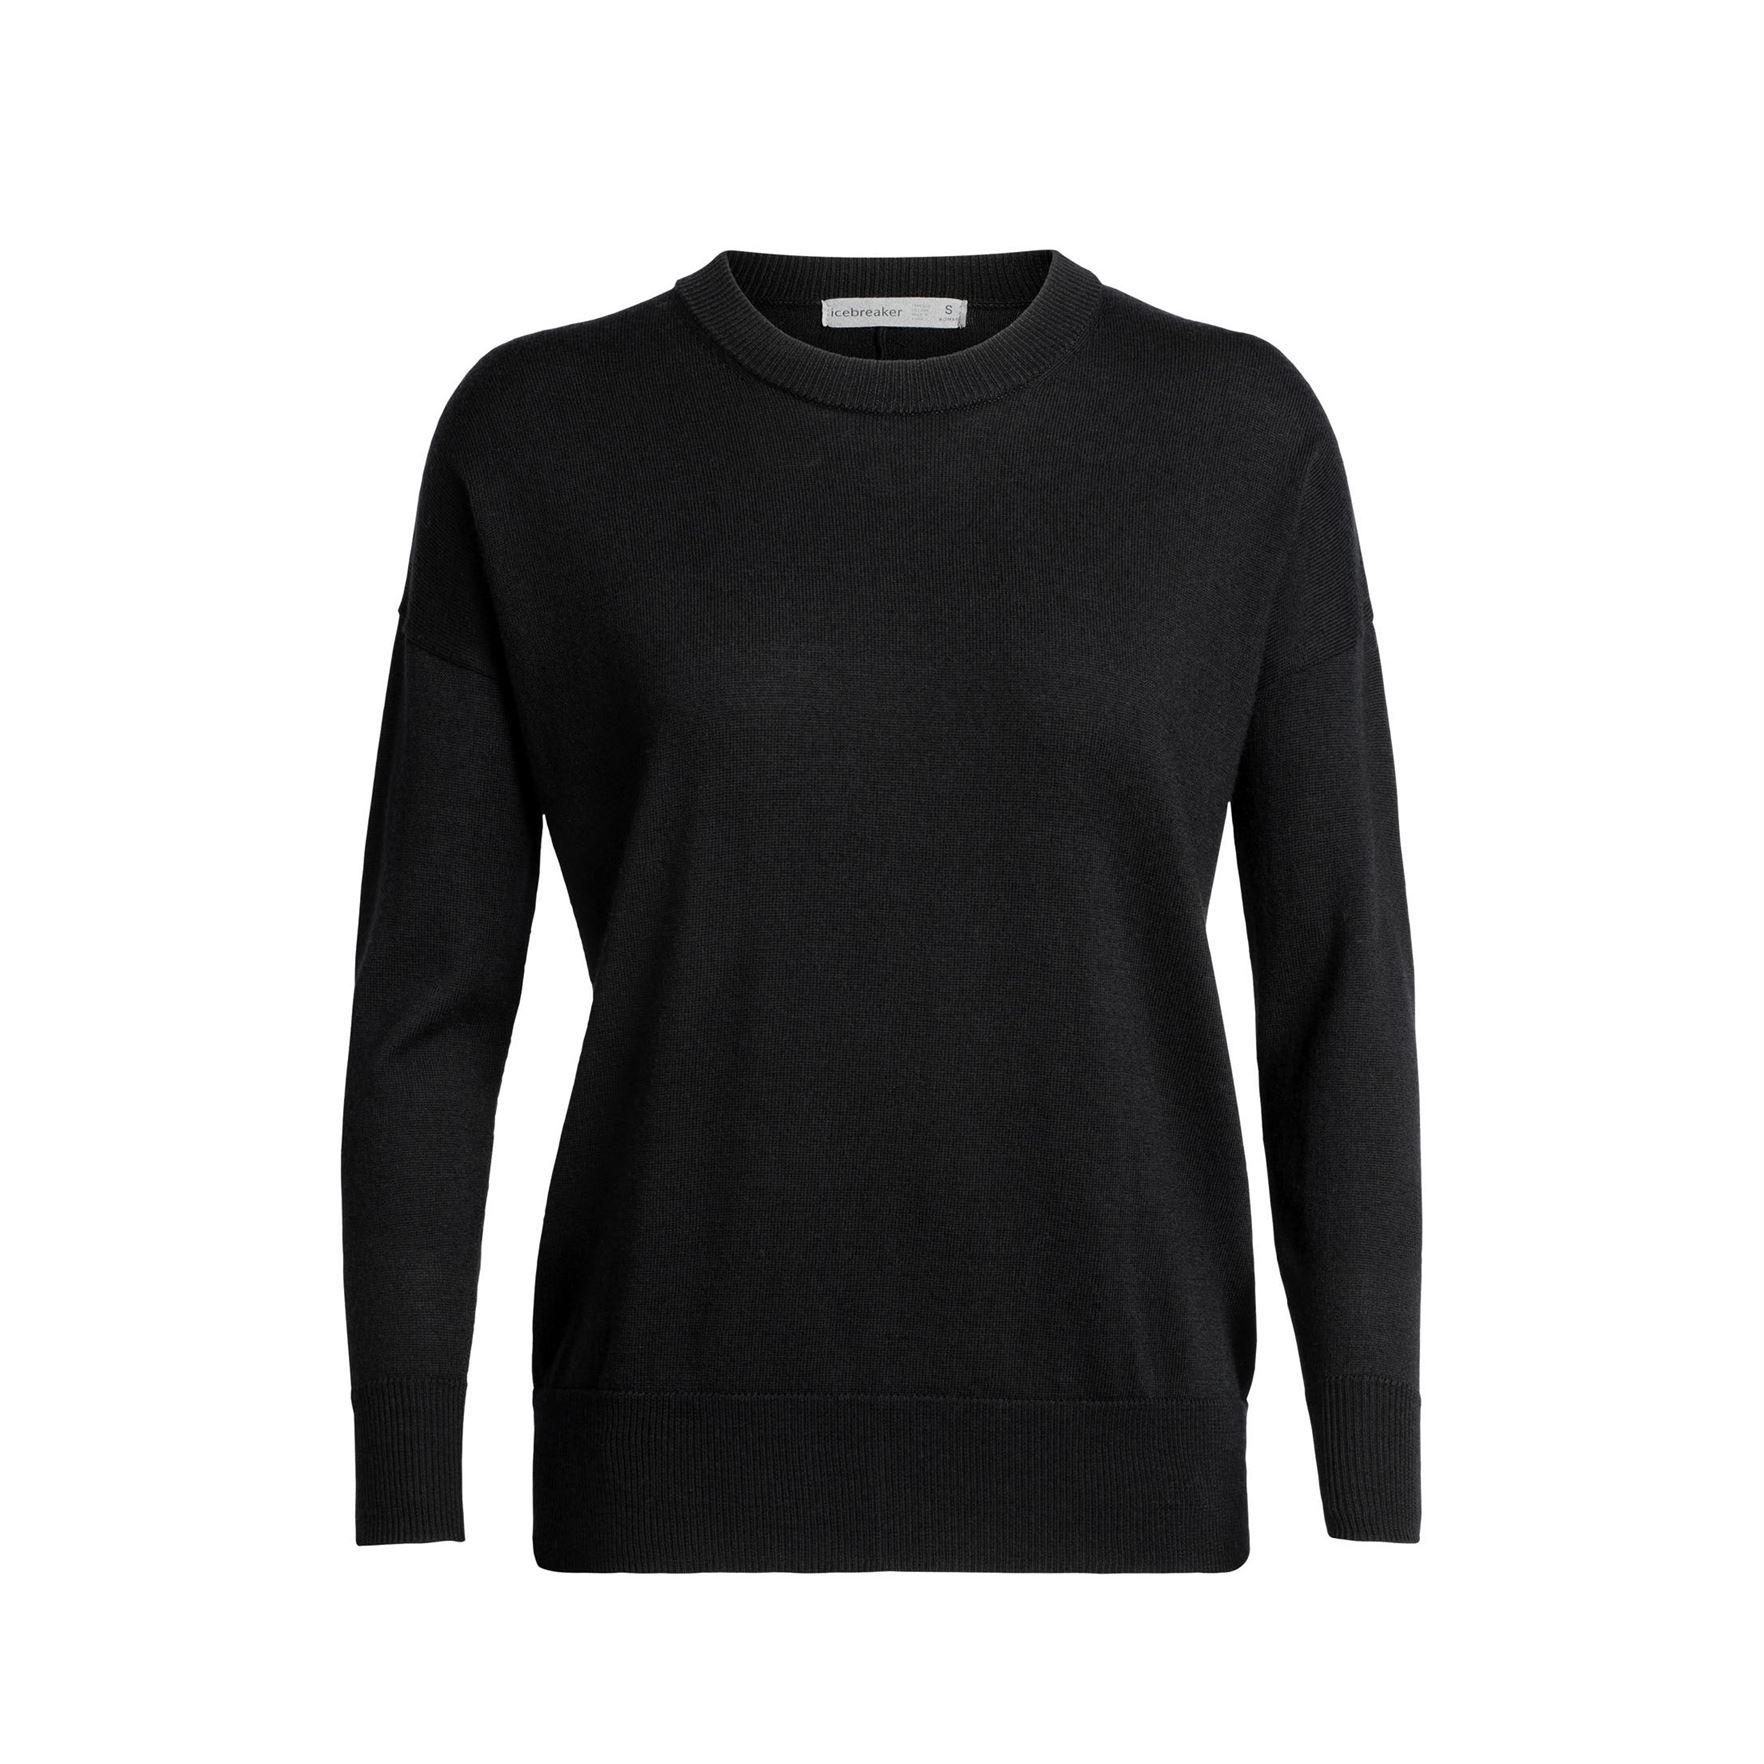 Shearer Crewe Sweater - Women's